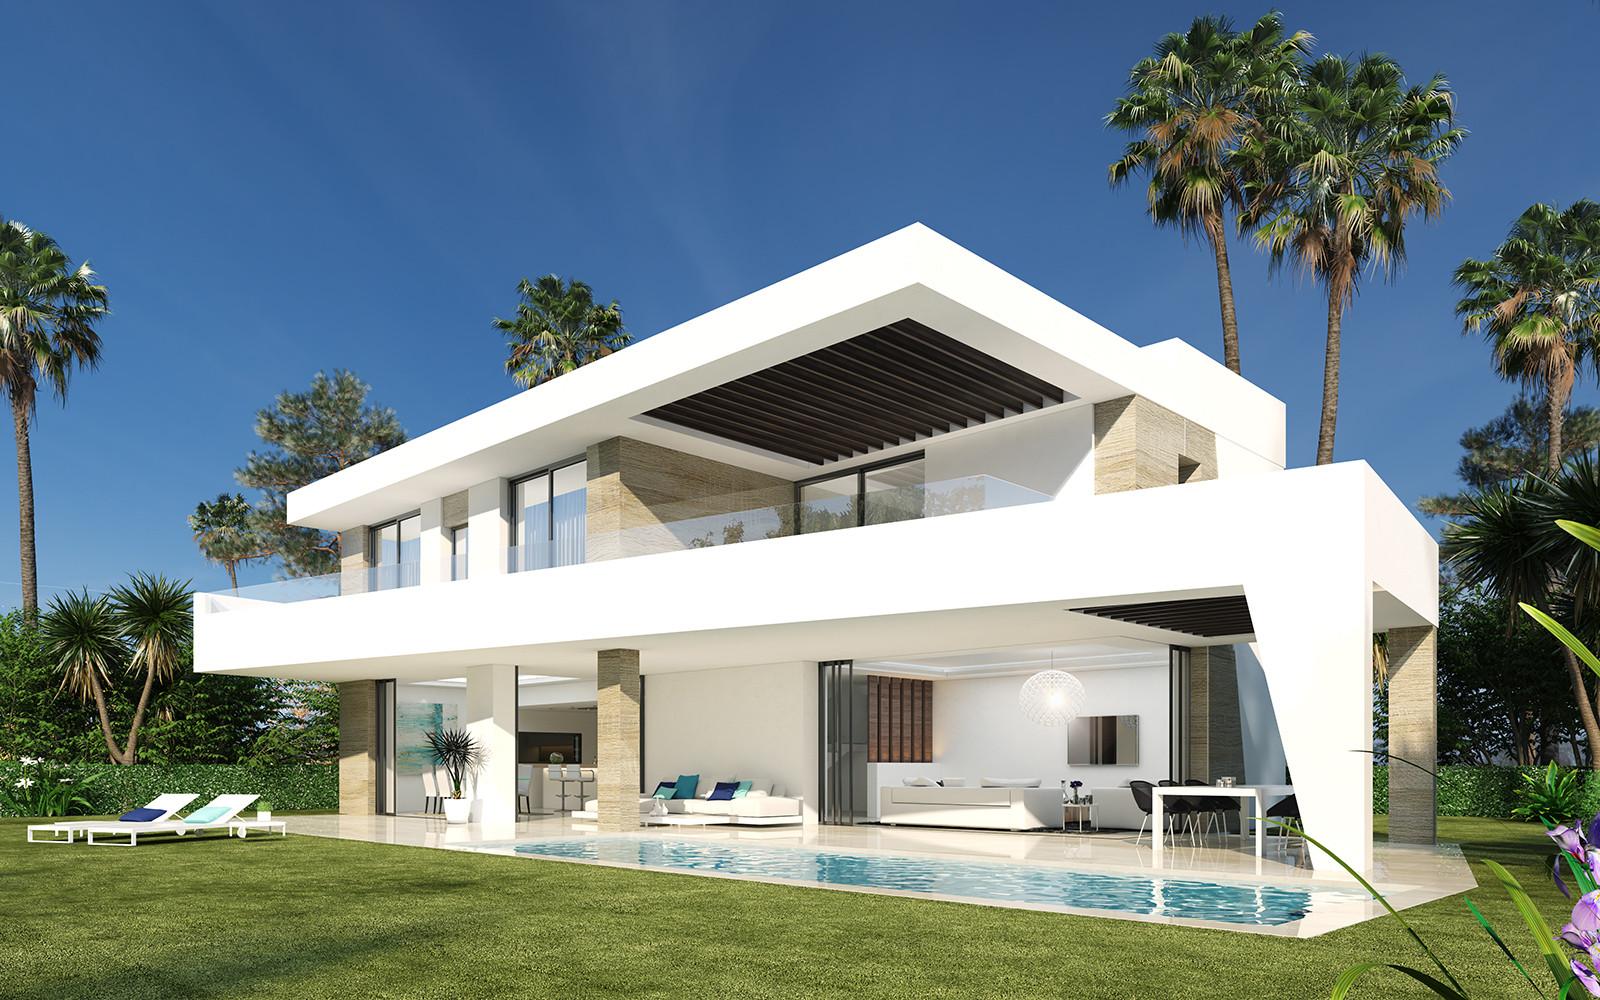 Image Property 209-01477P_34978.jpg